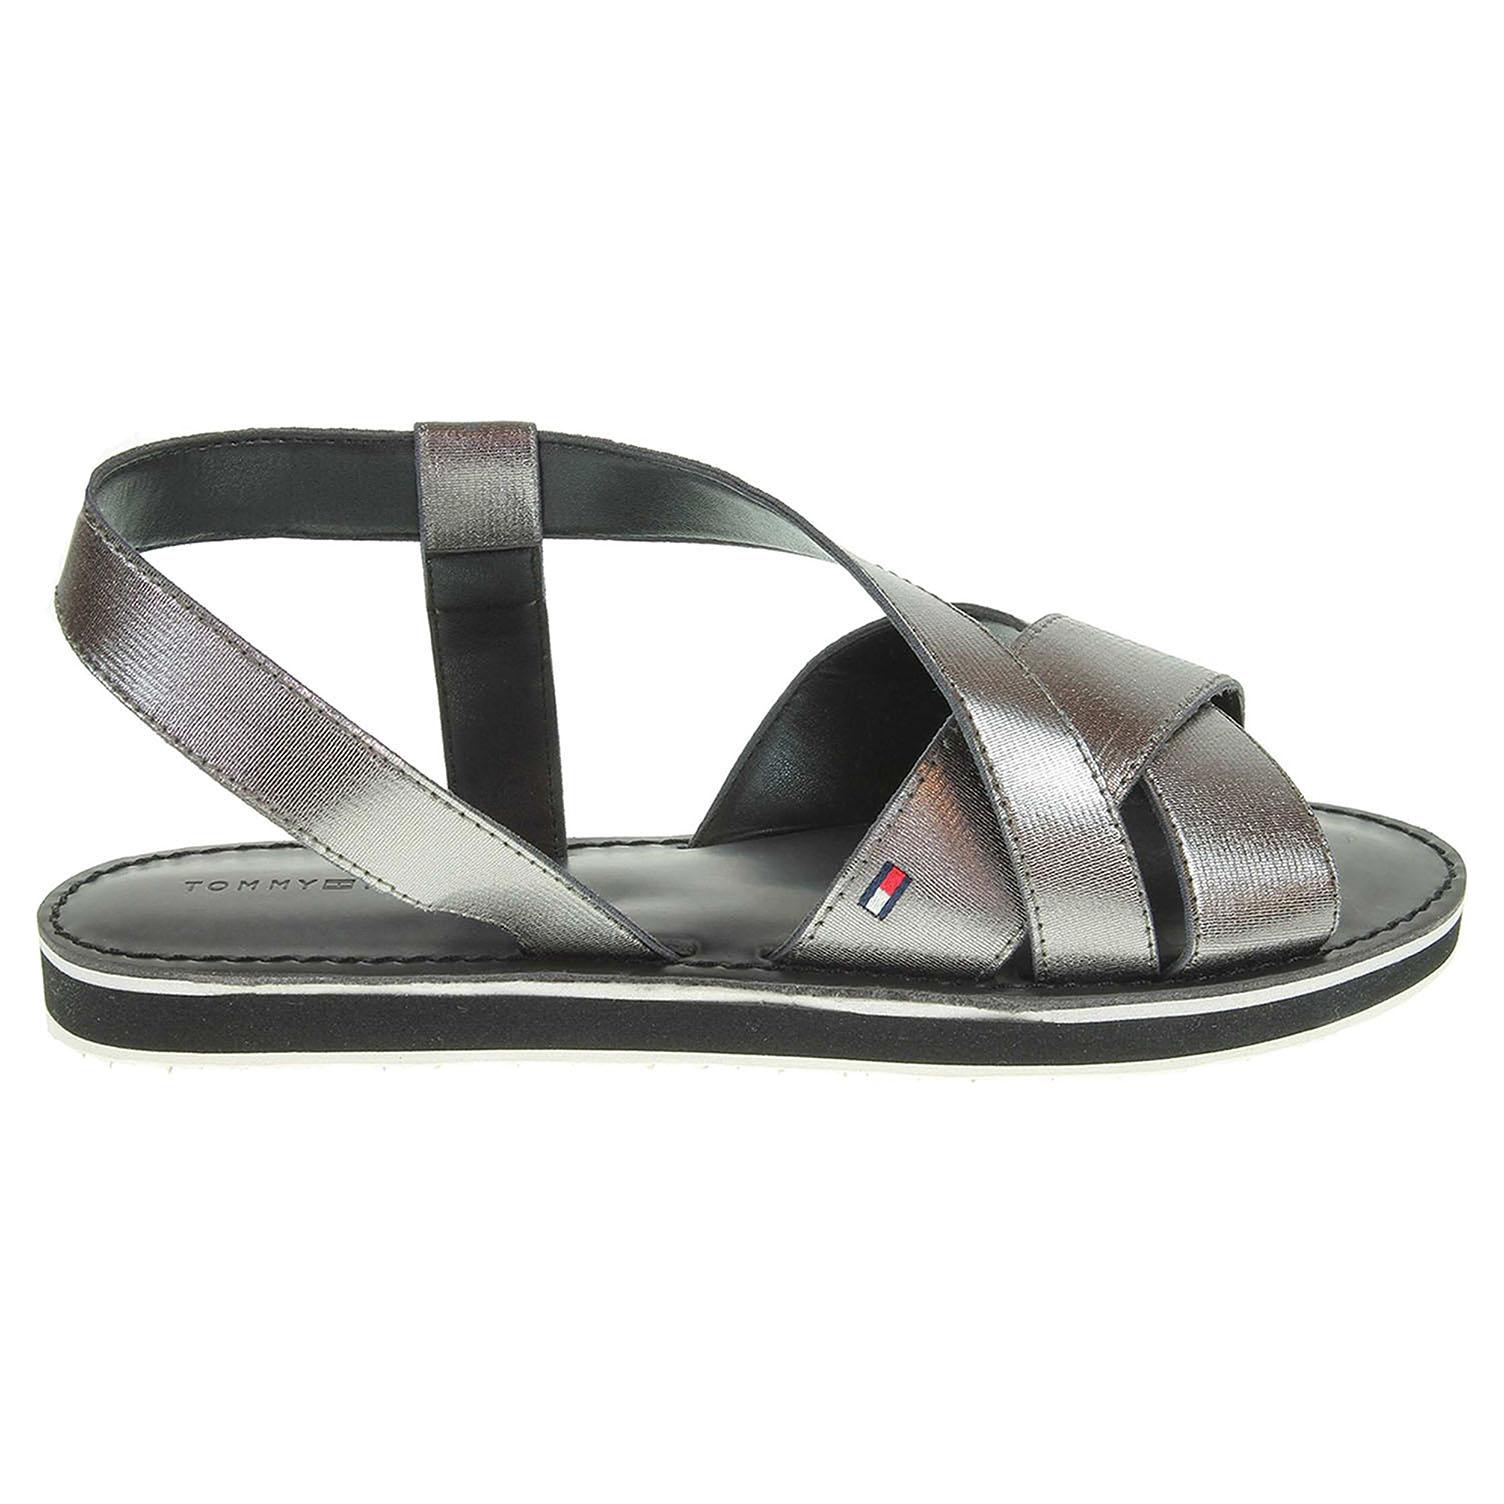 Ecco Tommy Hilfiger dámské sandály FW0FW01059 J1285ULIASP 1C2 bronzové  23801199 897e46977a